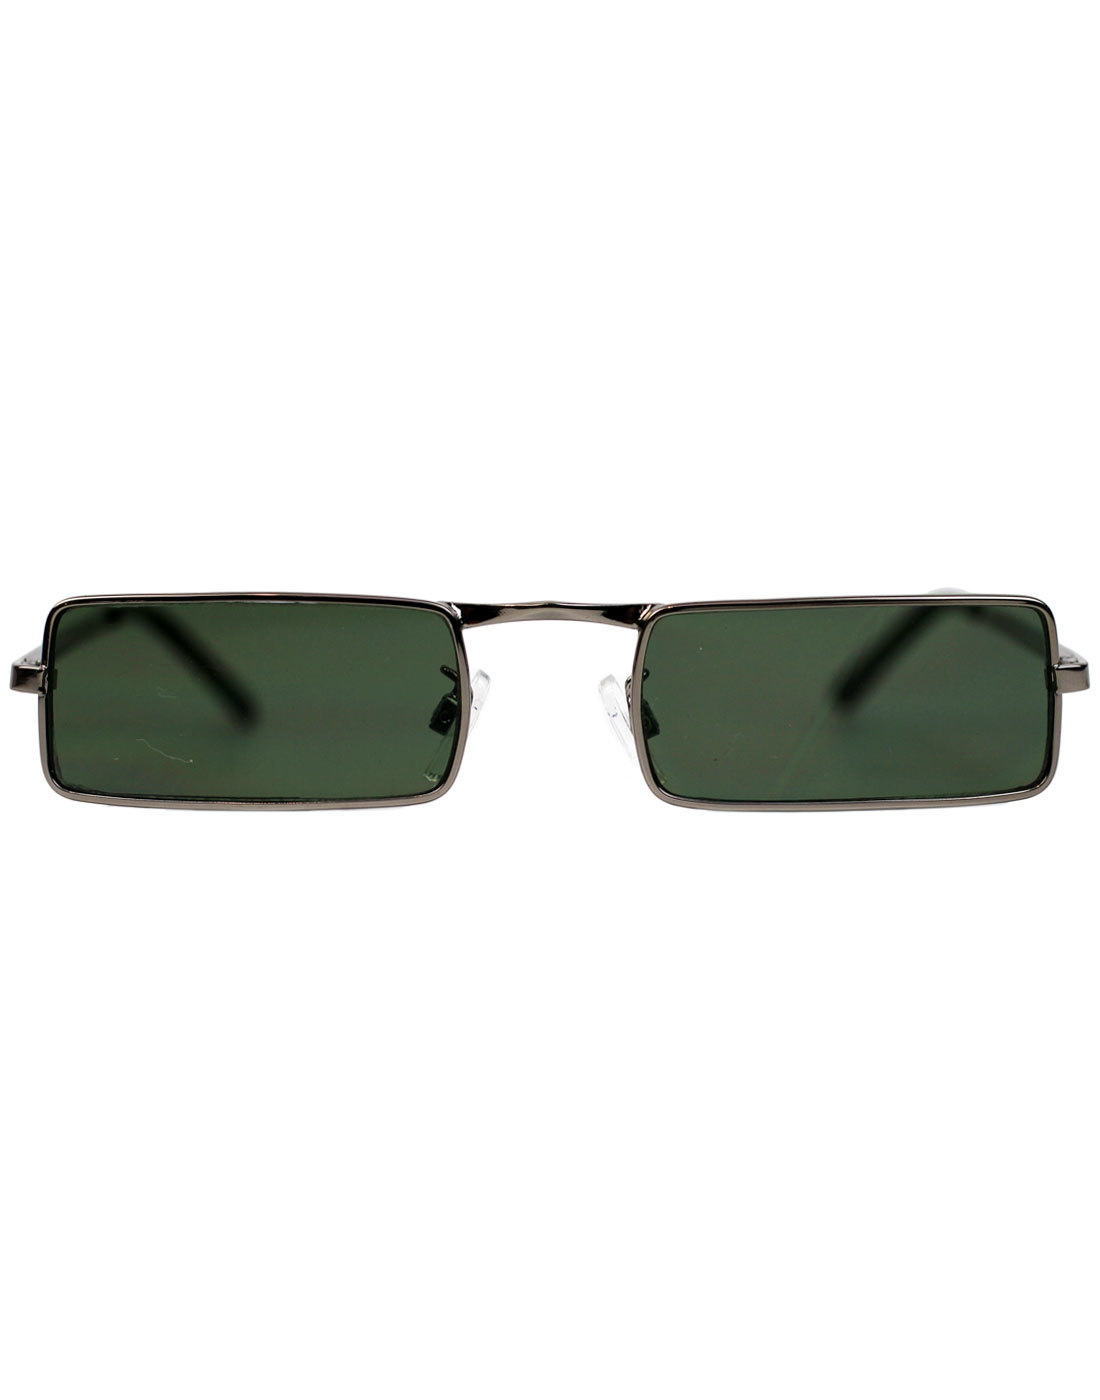 Granny Sunglasses  retro granny glasses square sunglasses roger mcguinn john lennon